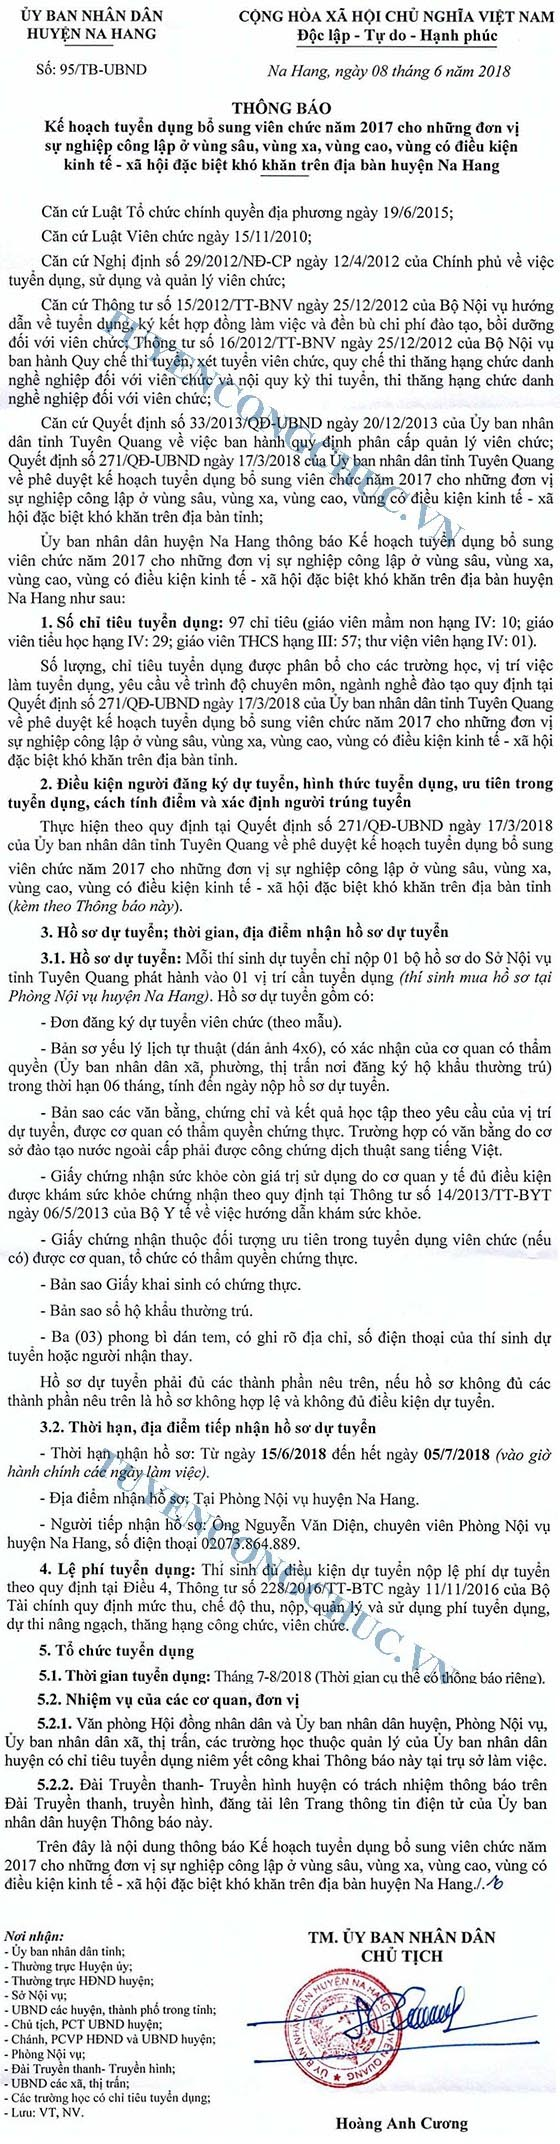 95-TBUB_huyen_1_20180616033412602600-1